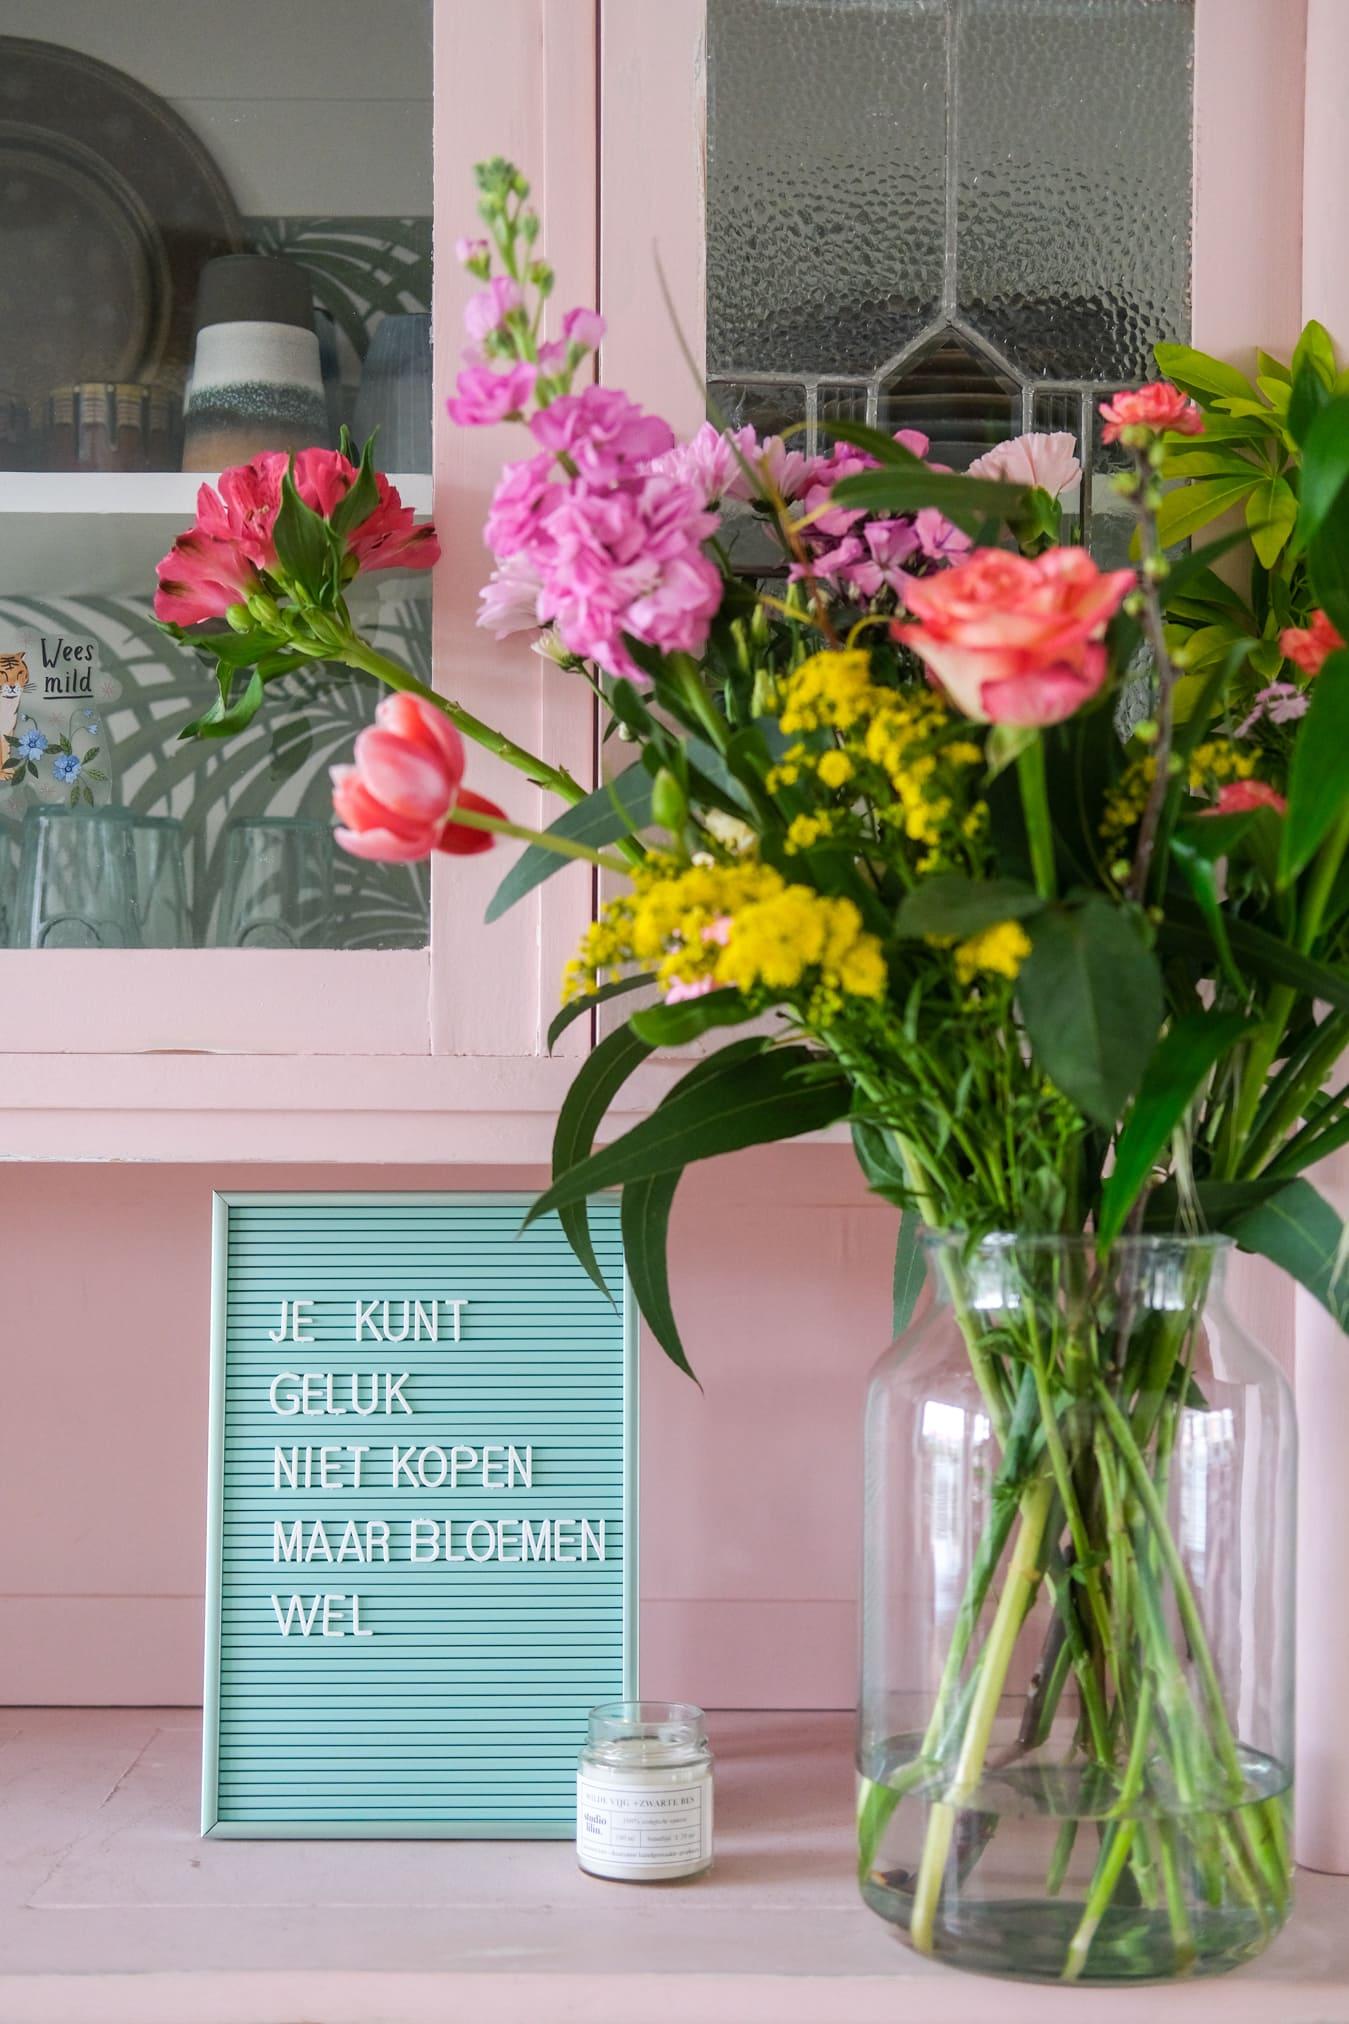 nederlandse citaten bloemen letterbord